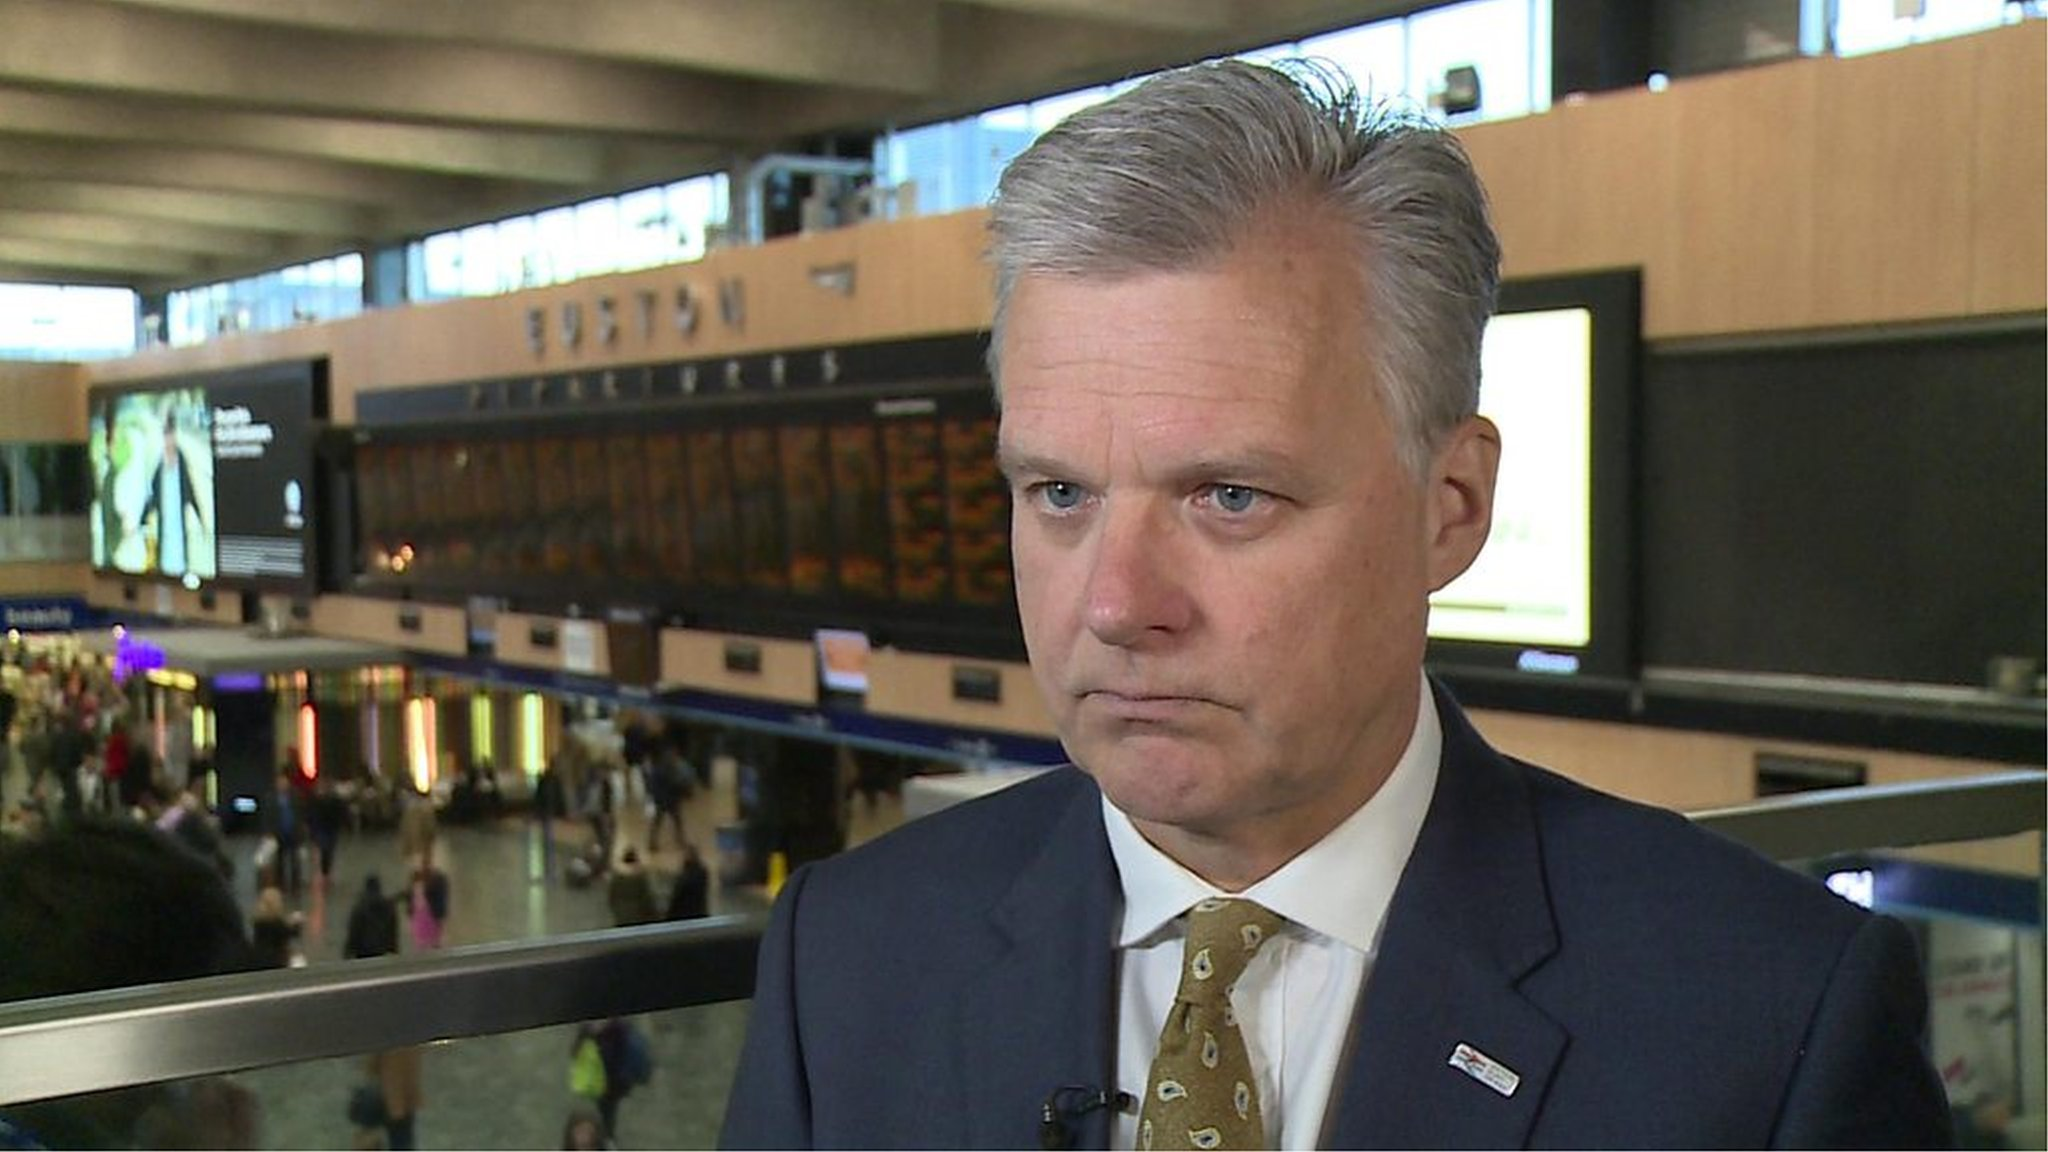 Birthday Honours 2018: Network Rail boss made CBE amid travel chaos